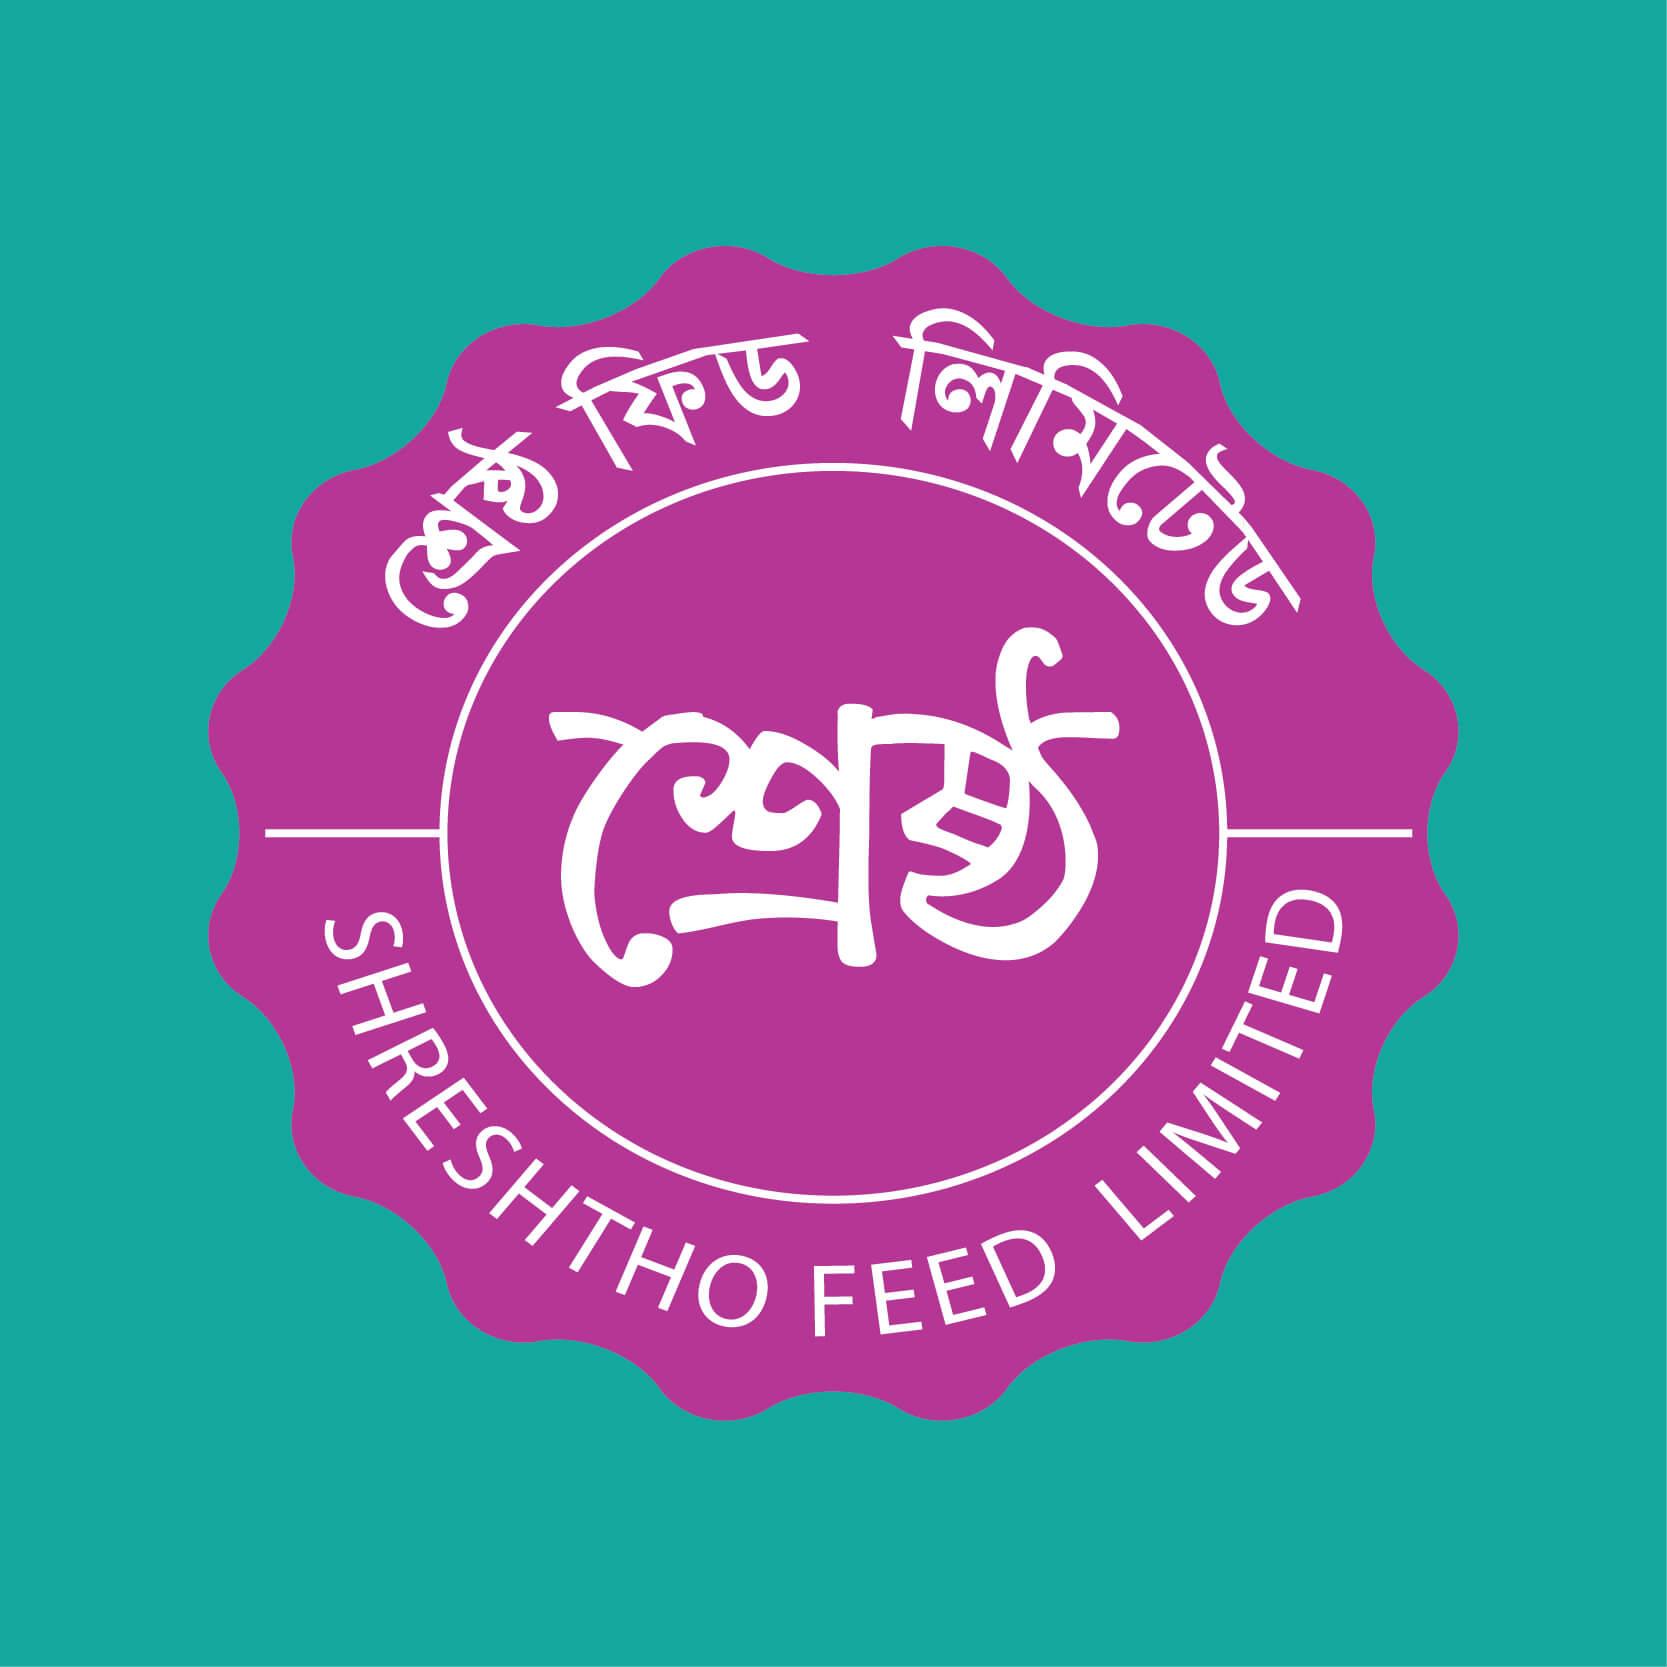 DTC-Clients-Served-Logo-Shreshtho